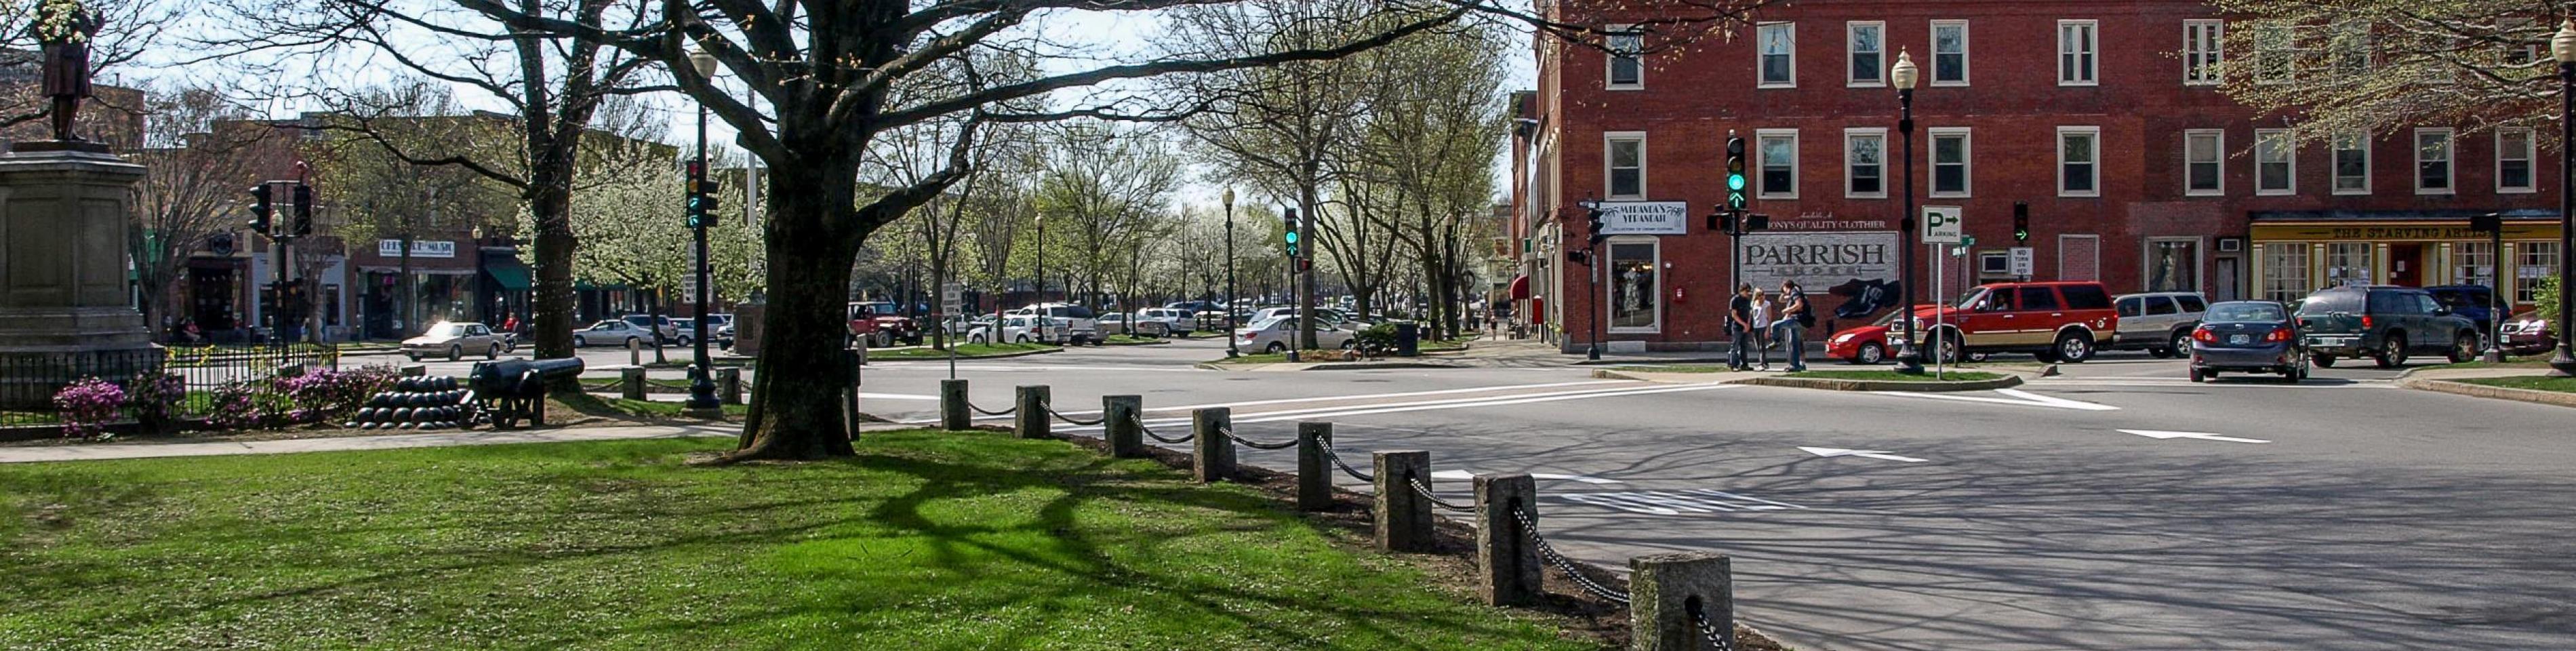 Downtown Keene Spring